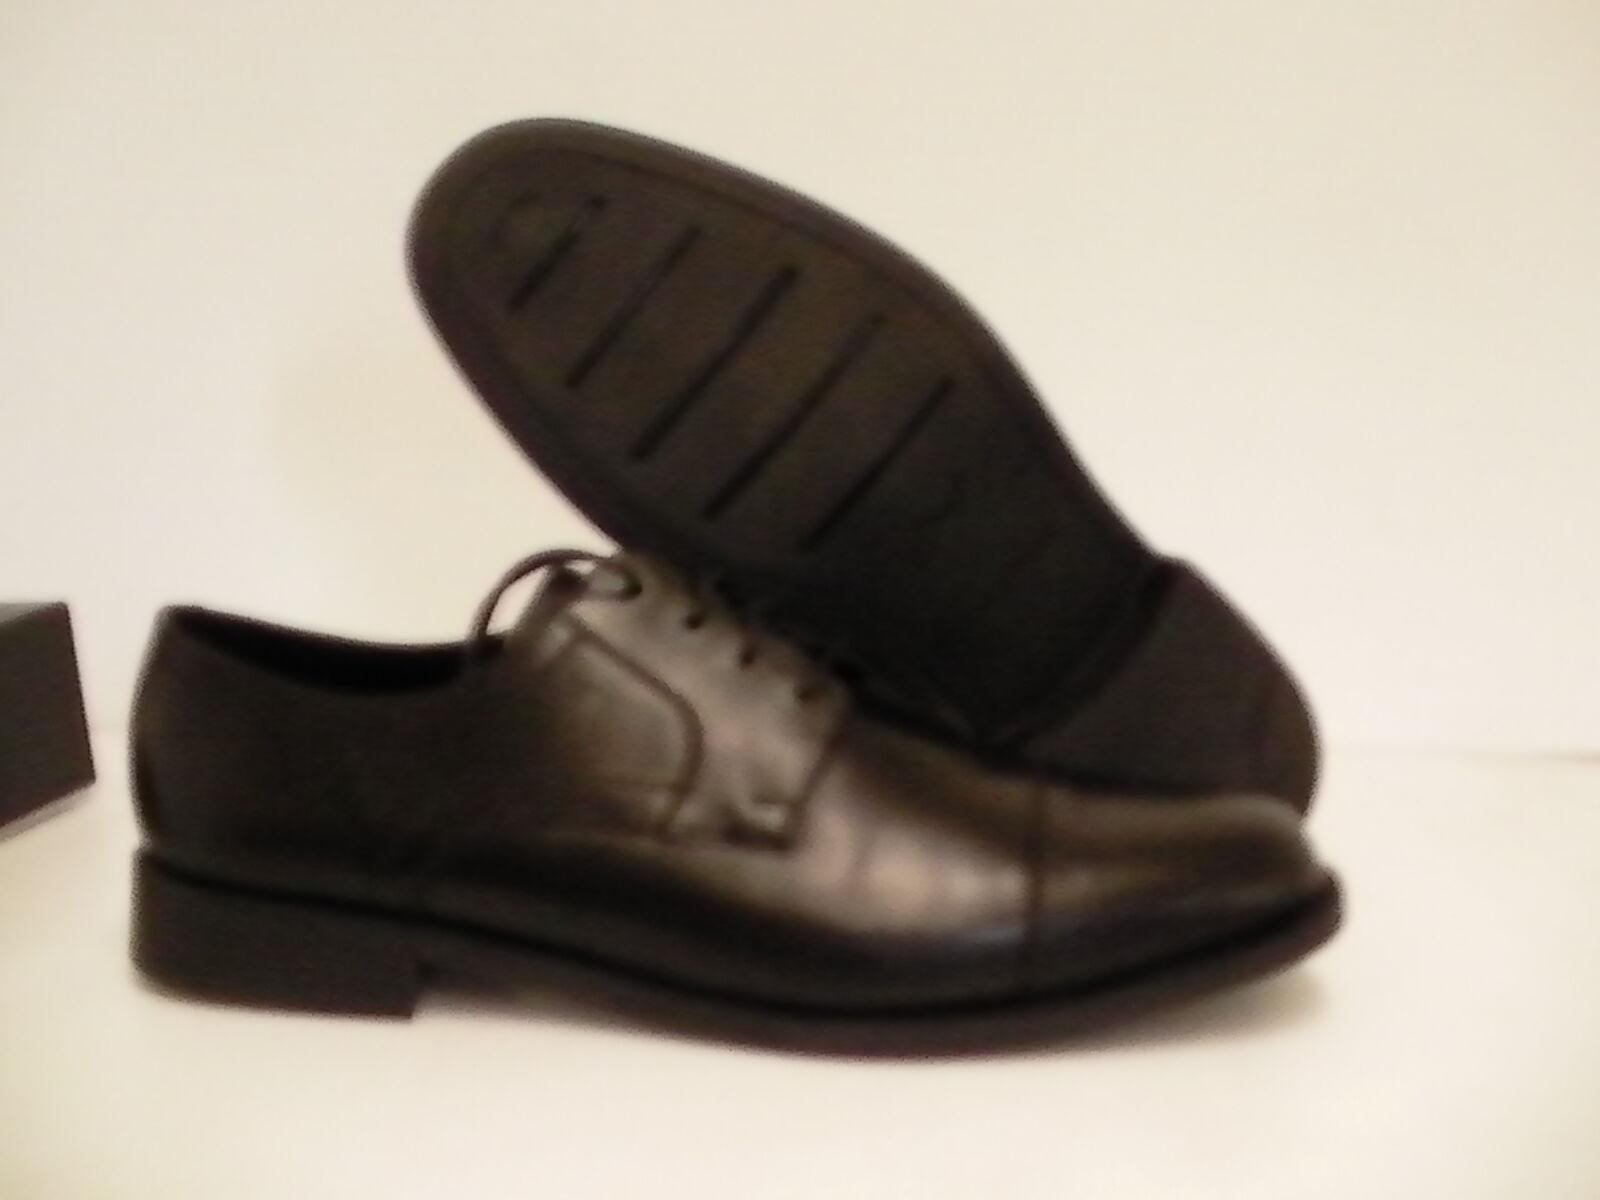 Cole Haan dressing shoes Dustin Cap oxford II size 11.5 men us